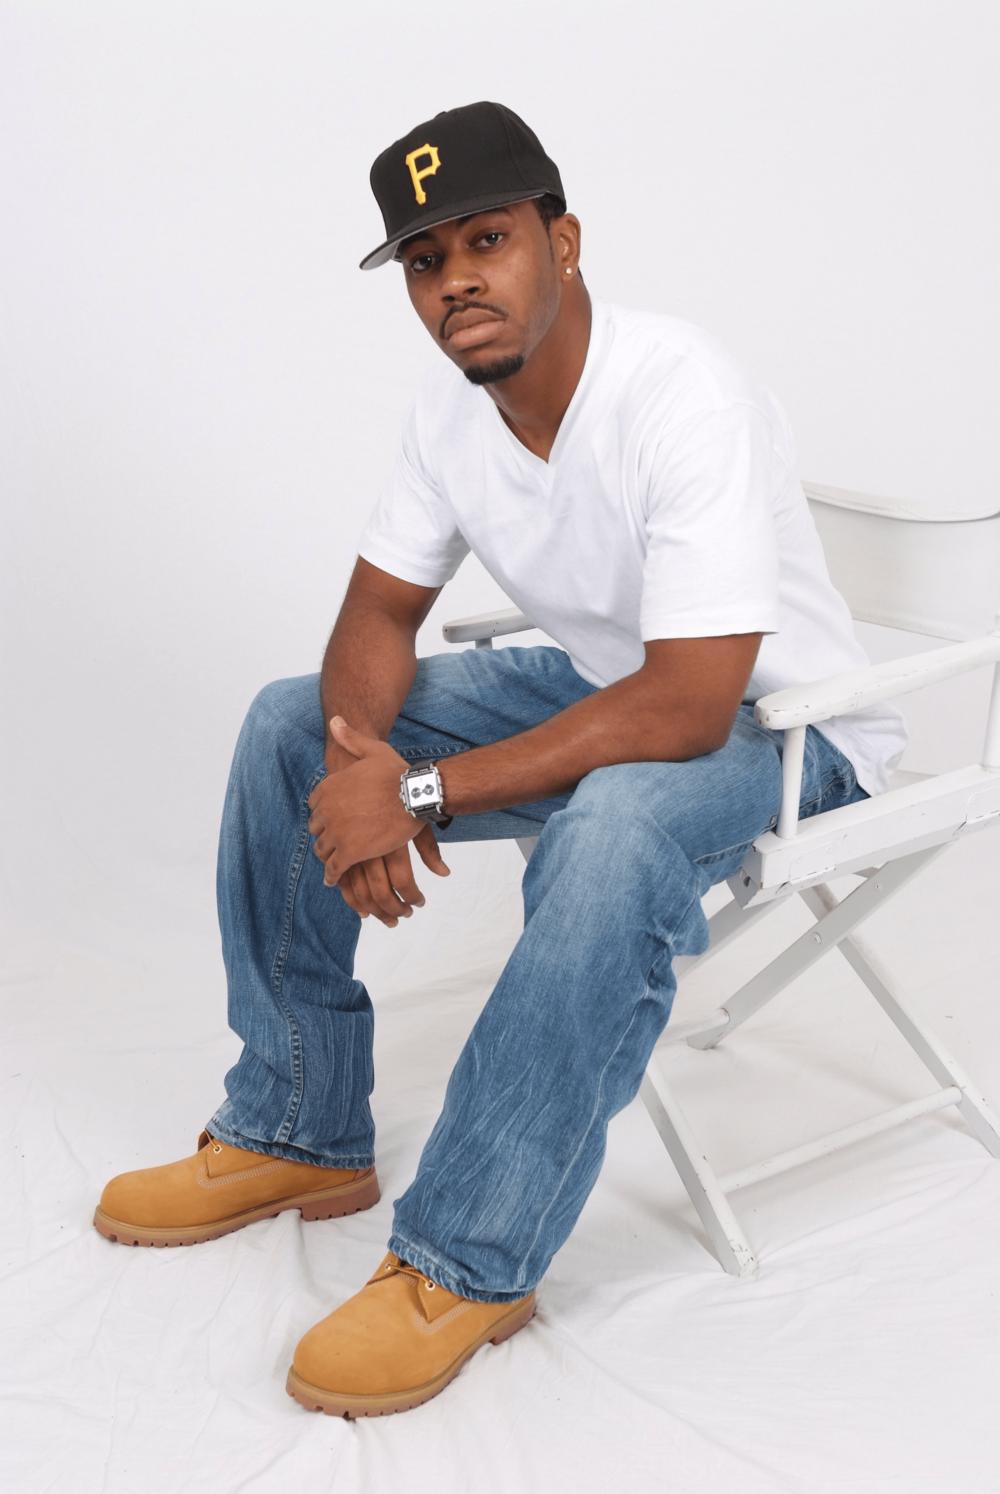 Prentice rap artist interview